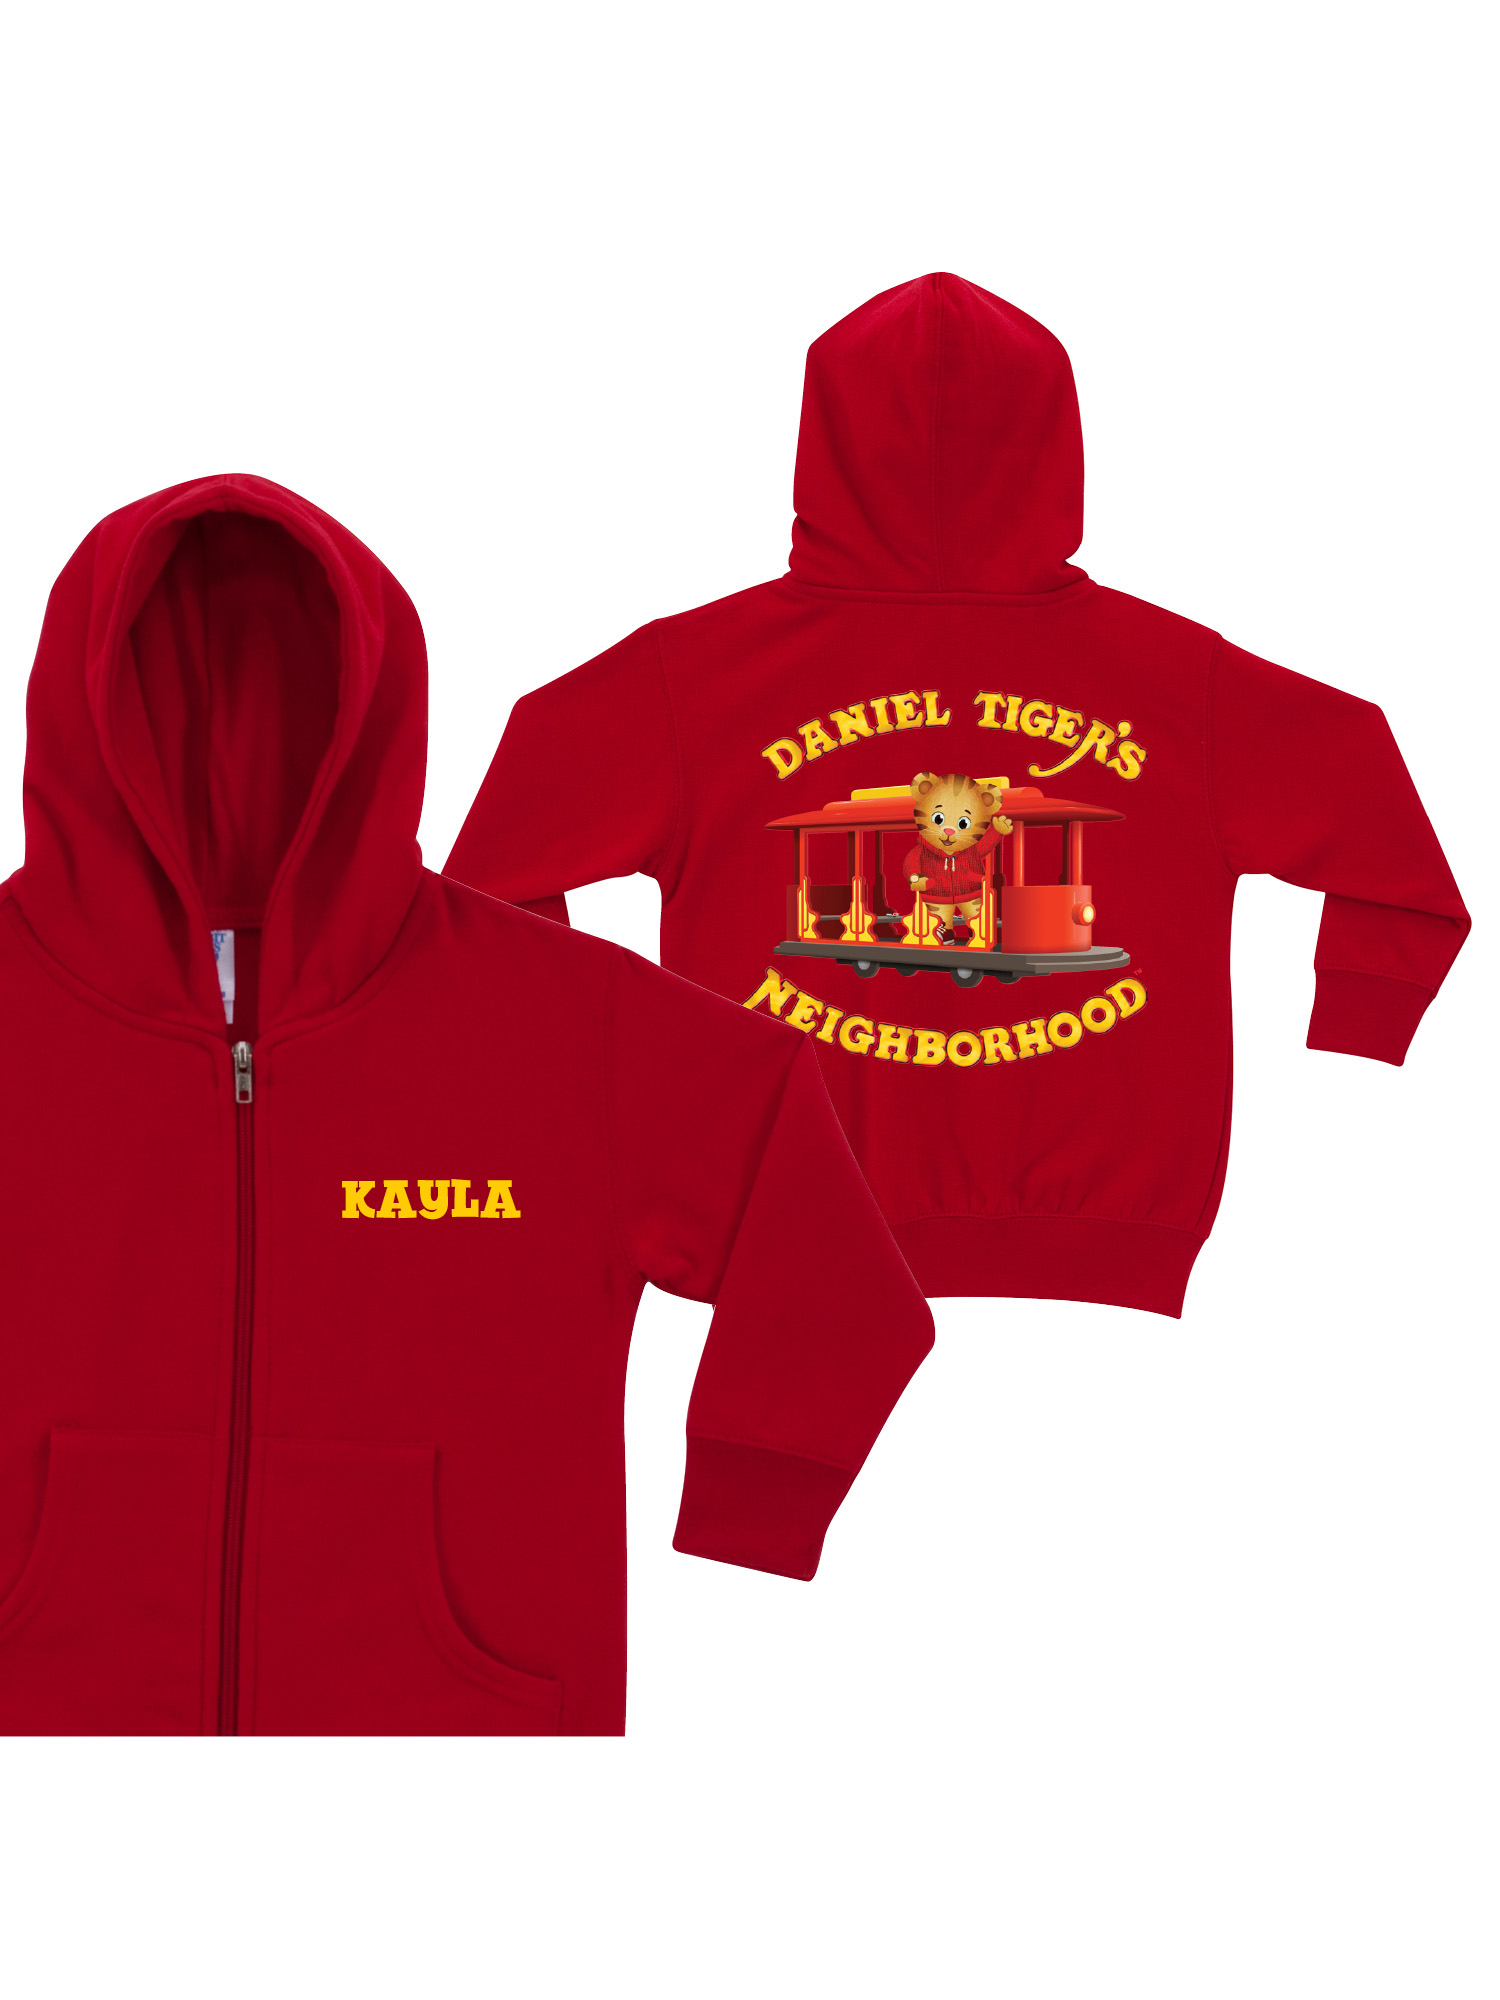 Personalized Daniel Tiger's Neighborhood Toddlers' Red Zip-Up Hoodie